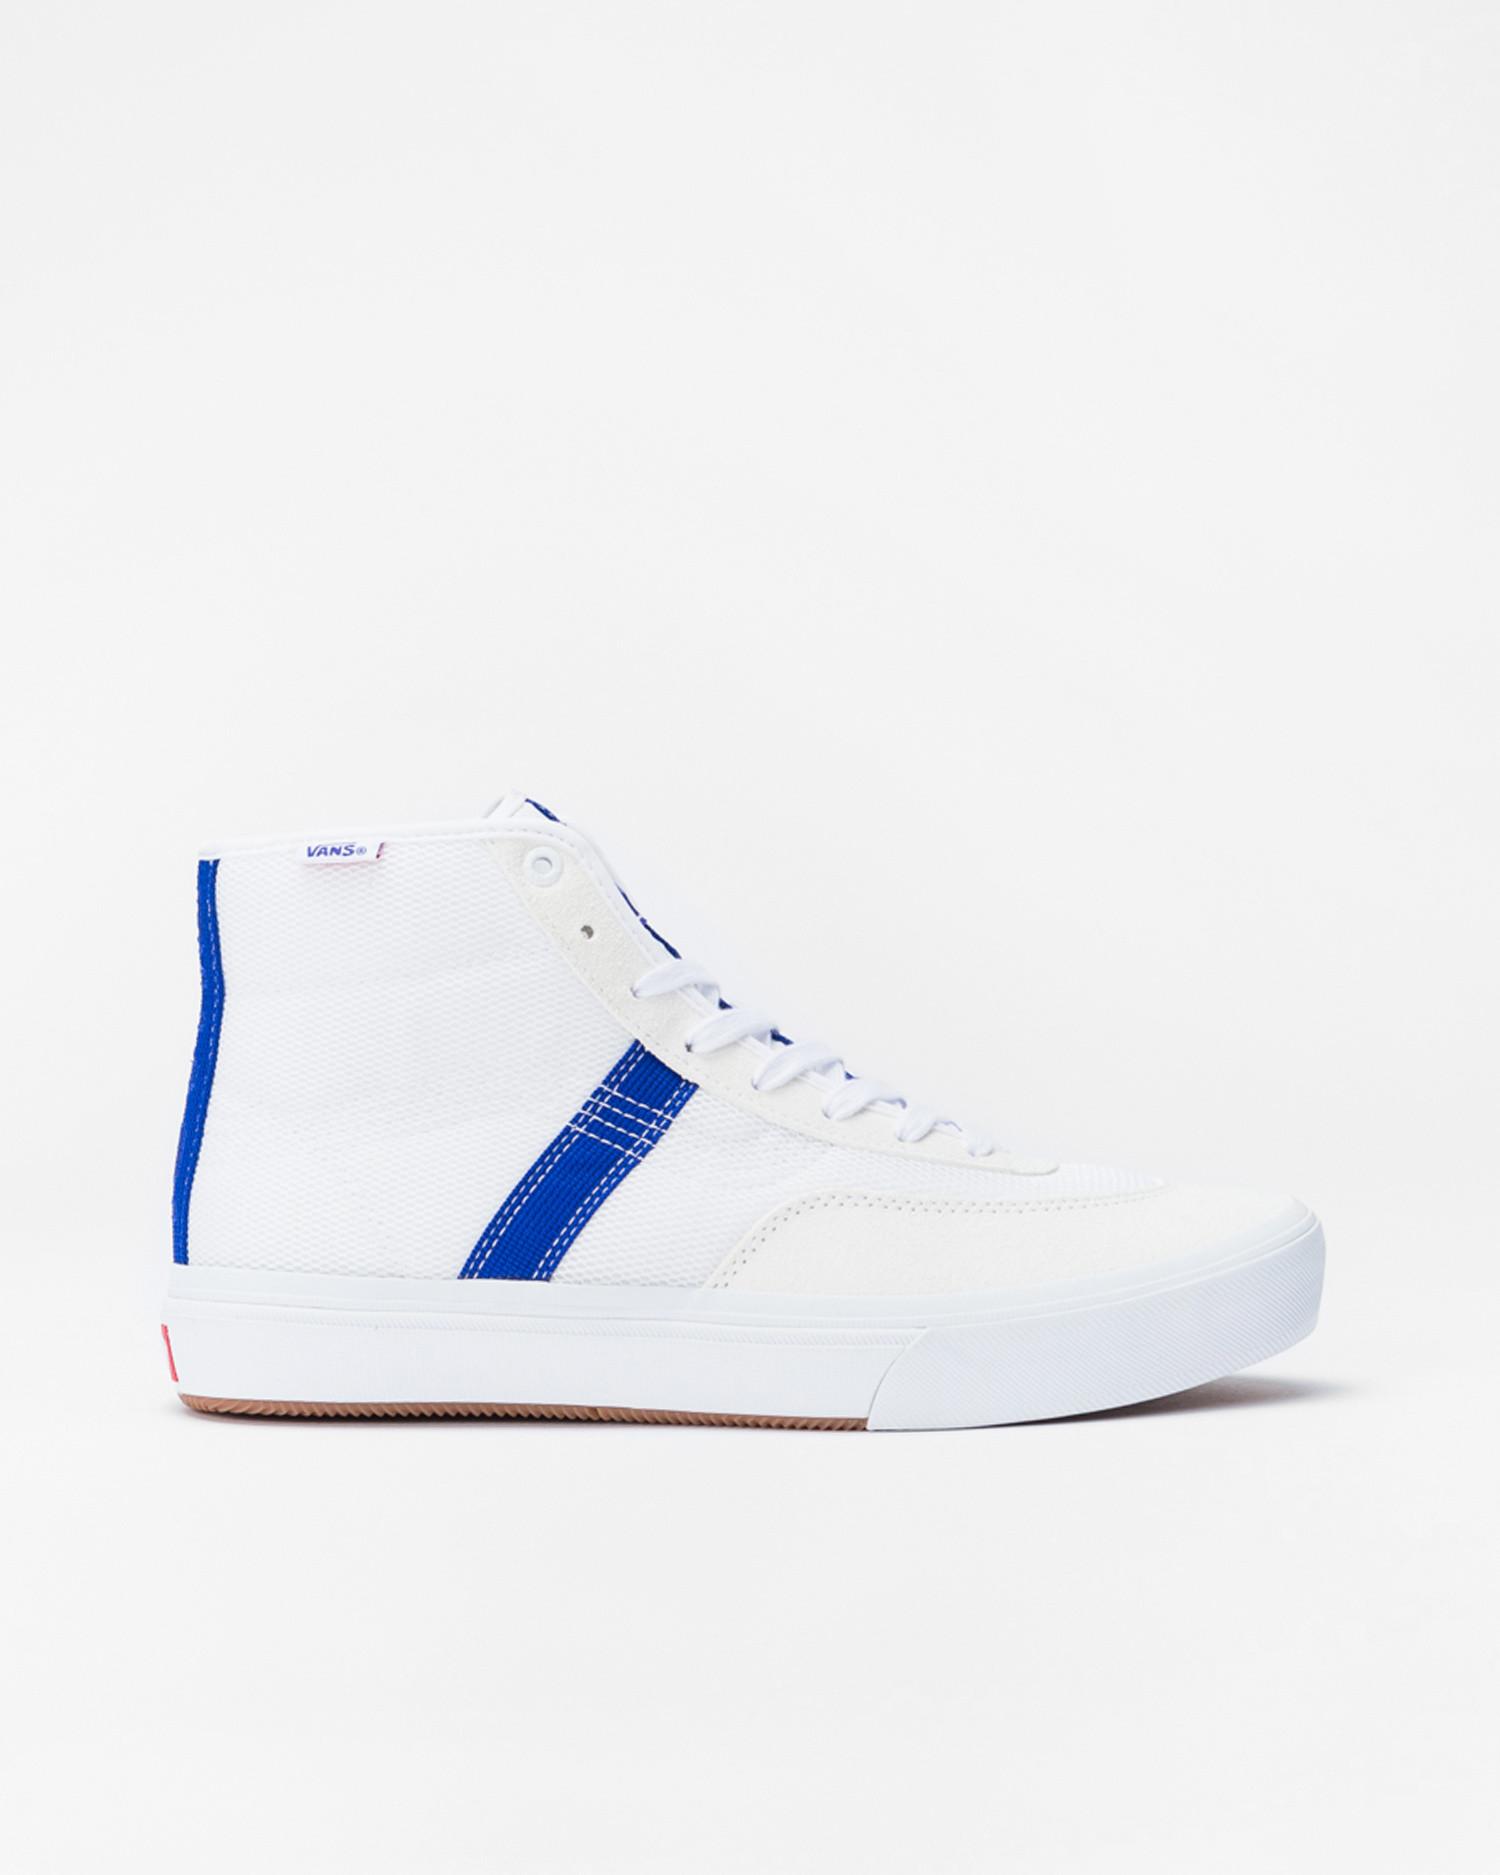 Vans X Quasi Crockett High Pro LTD Antique White